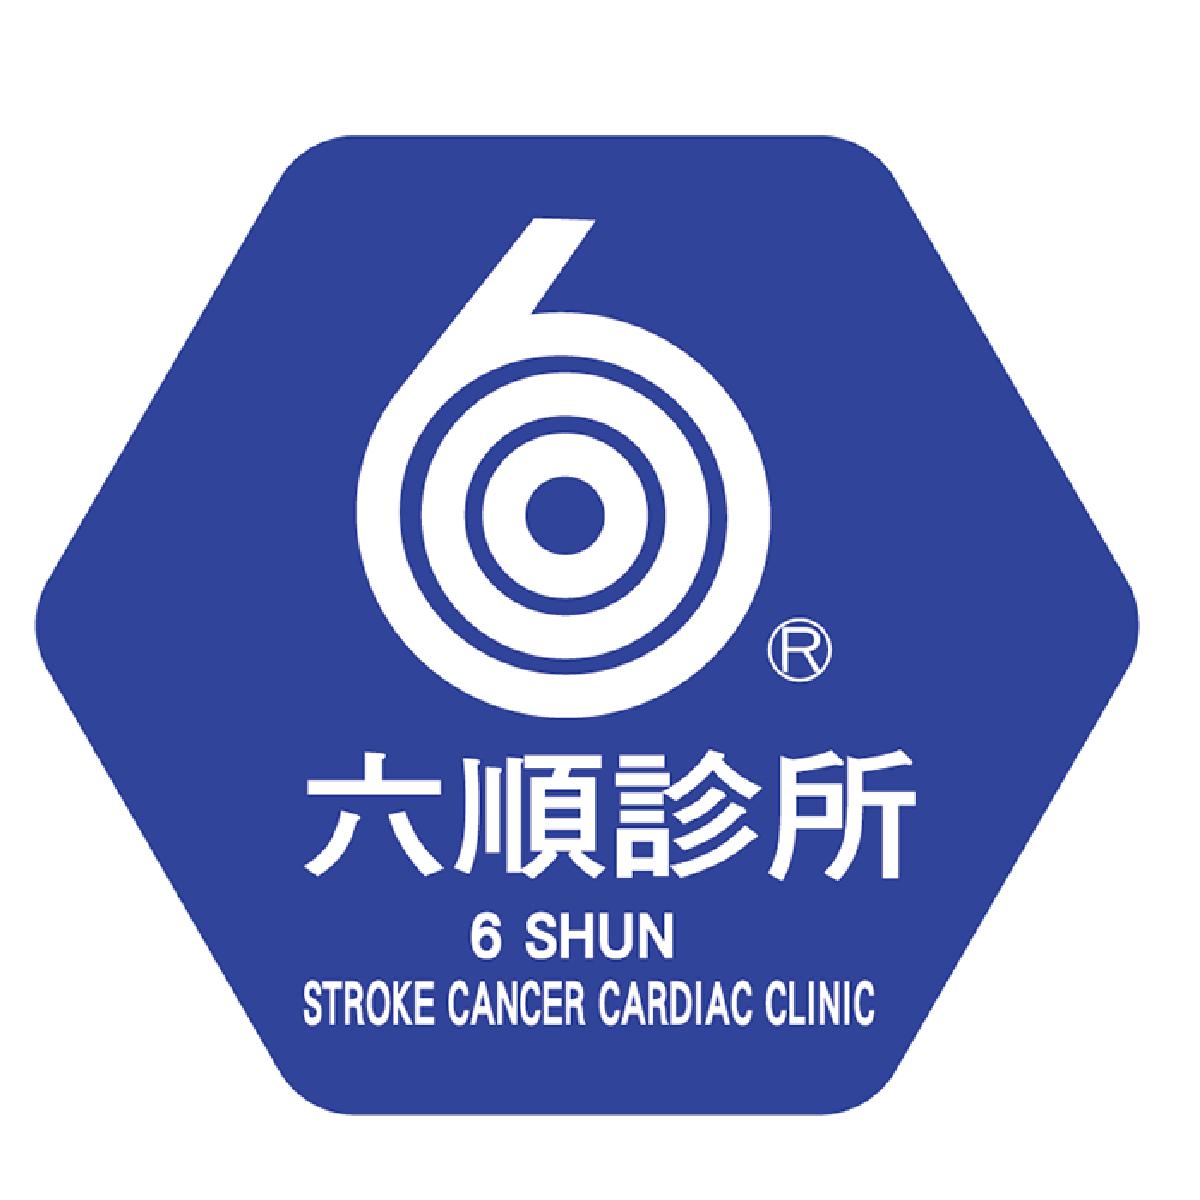 【六順診所】6 SHUN  STROKE CANCER CARDIAC CLINIC